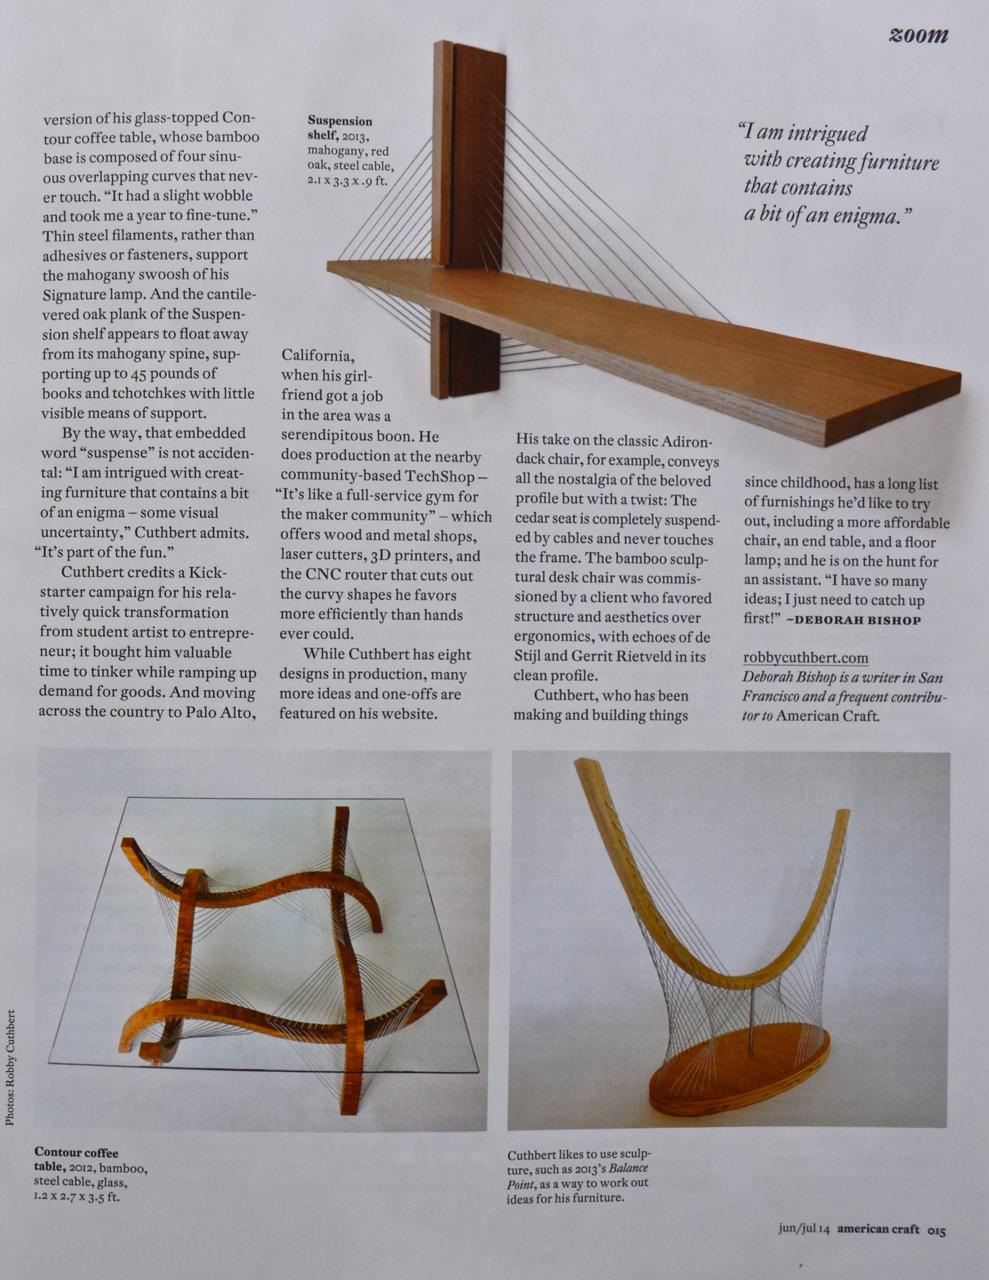 Robby Cuthbert Design American Craft 2